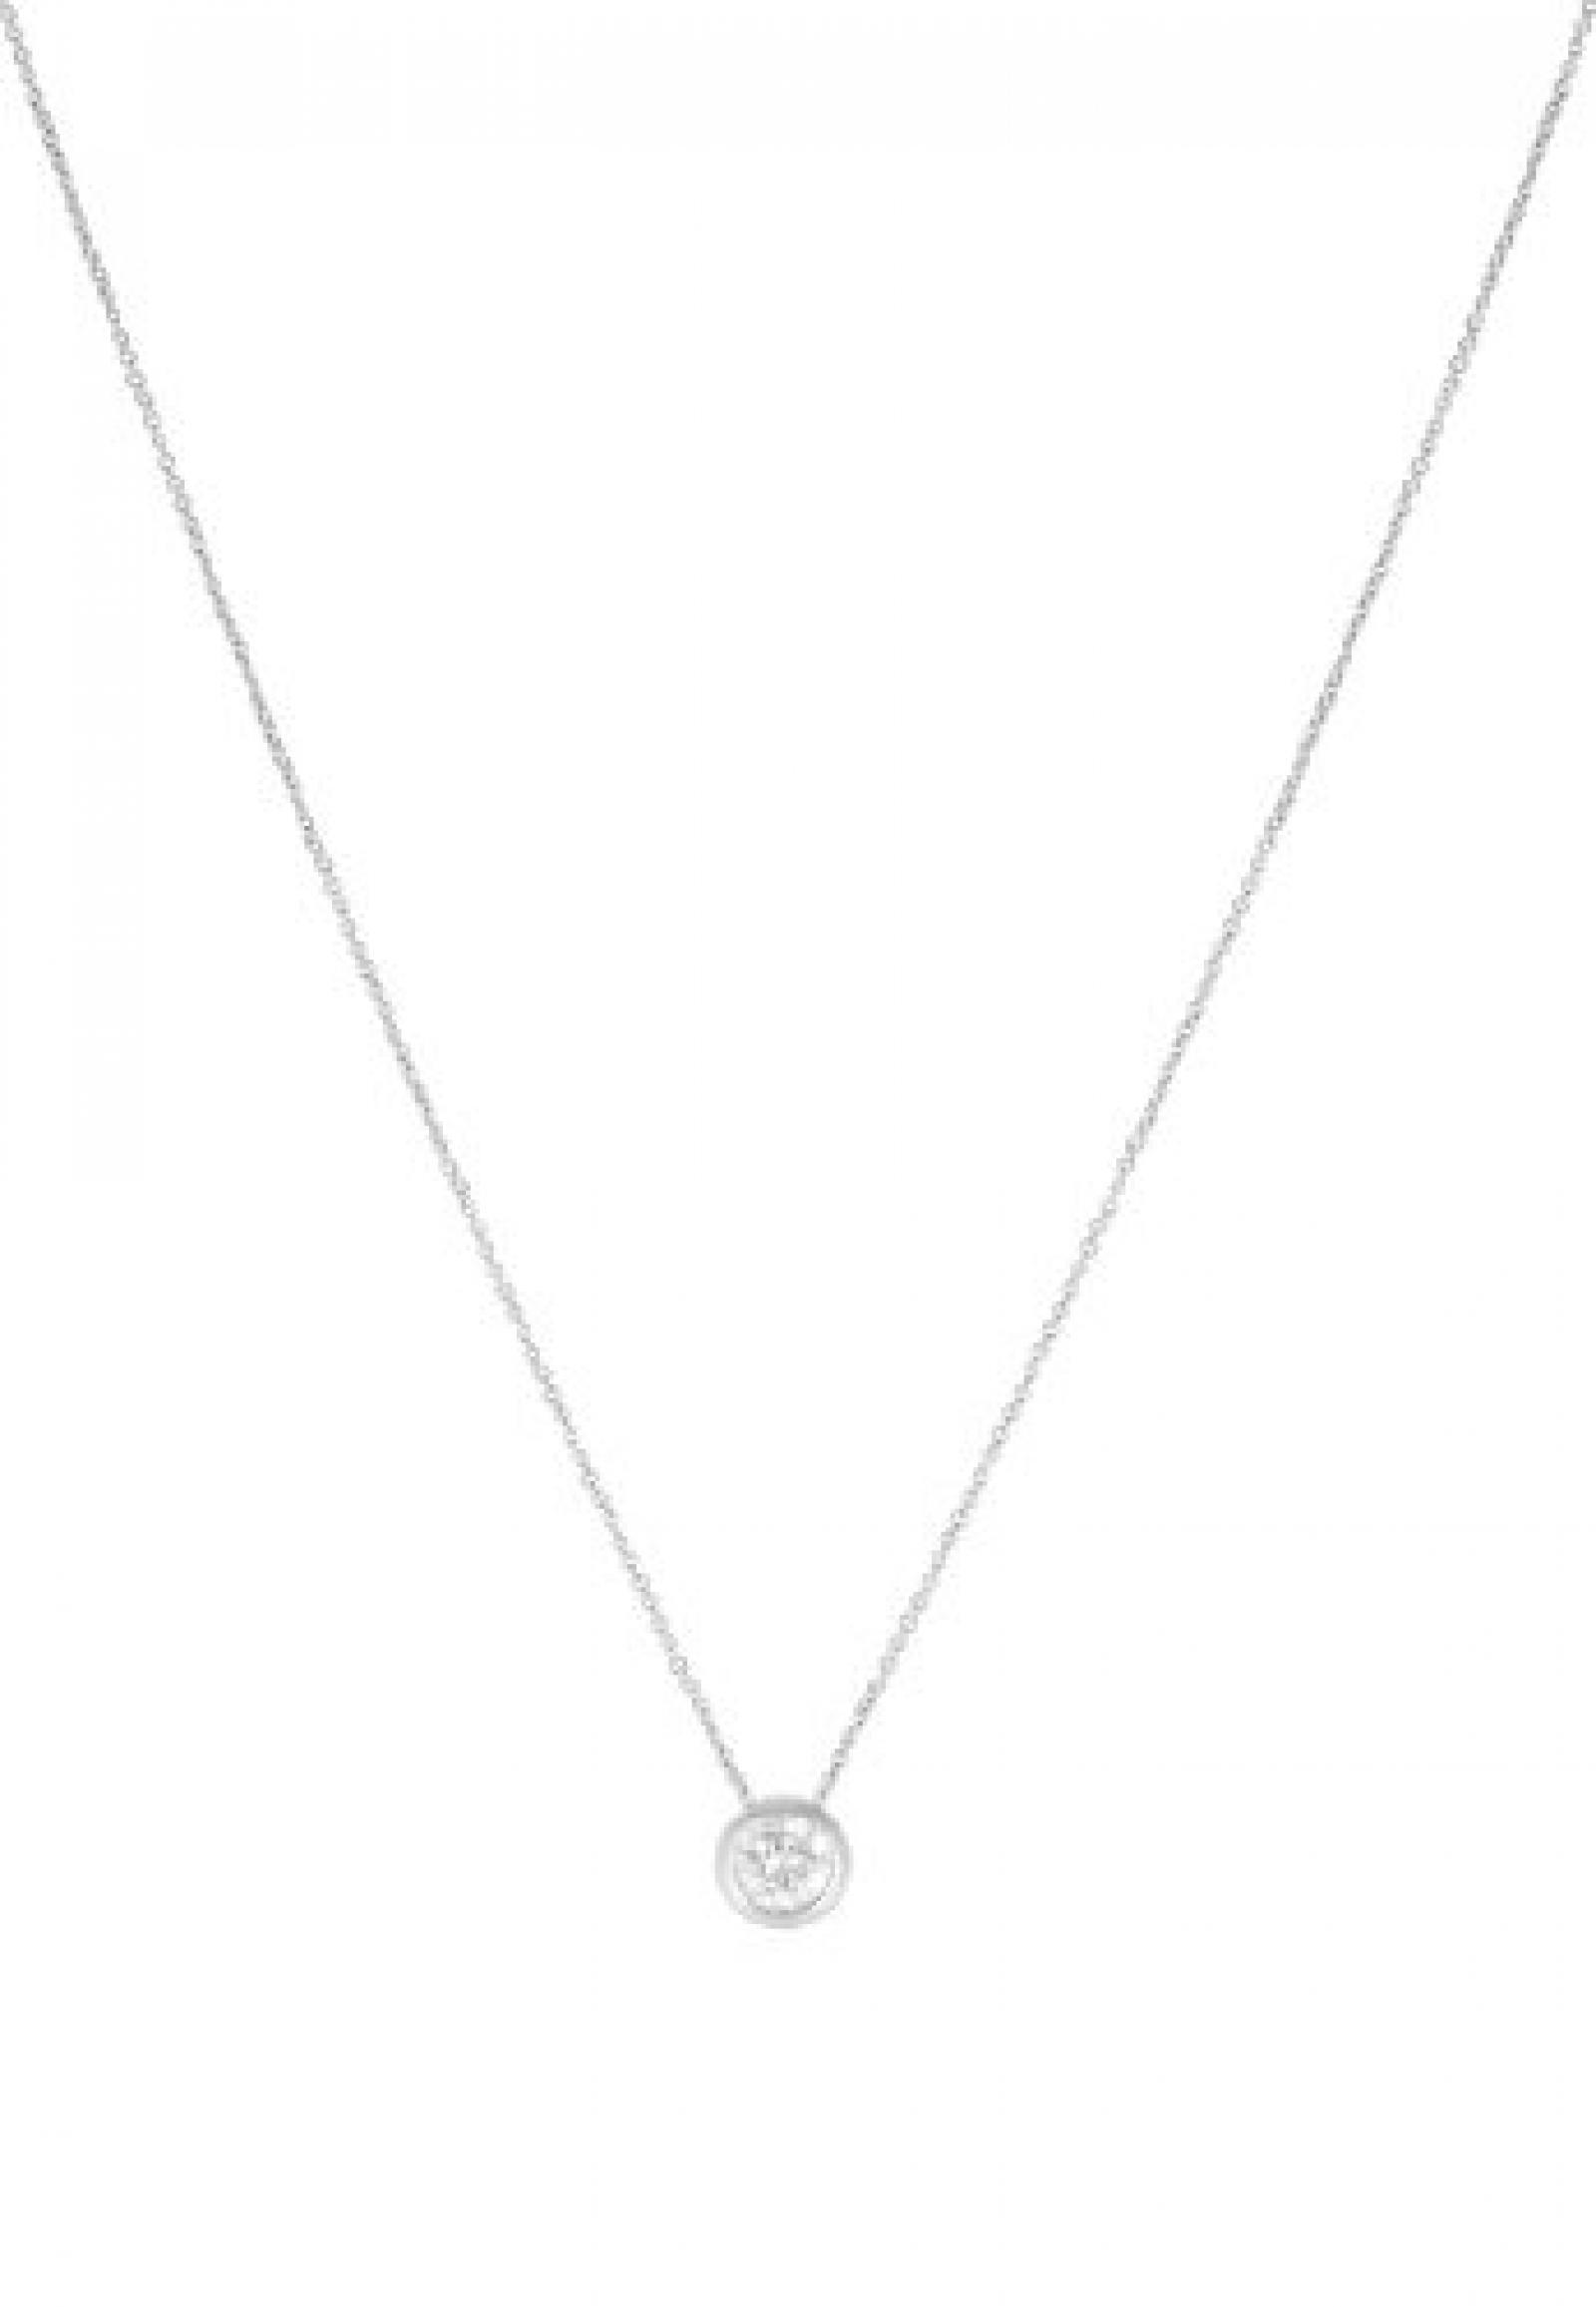 JETTE Silver Damen-Kette BASIC 925er Silber 1 Zirkonia silber, One Size